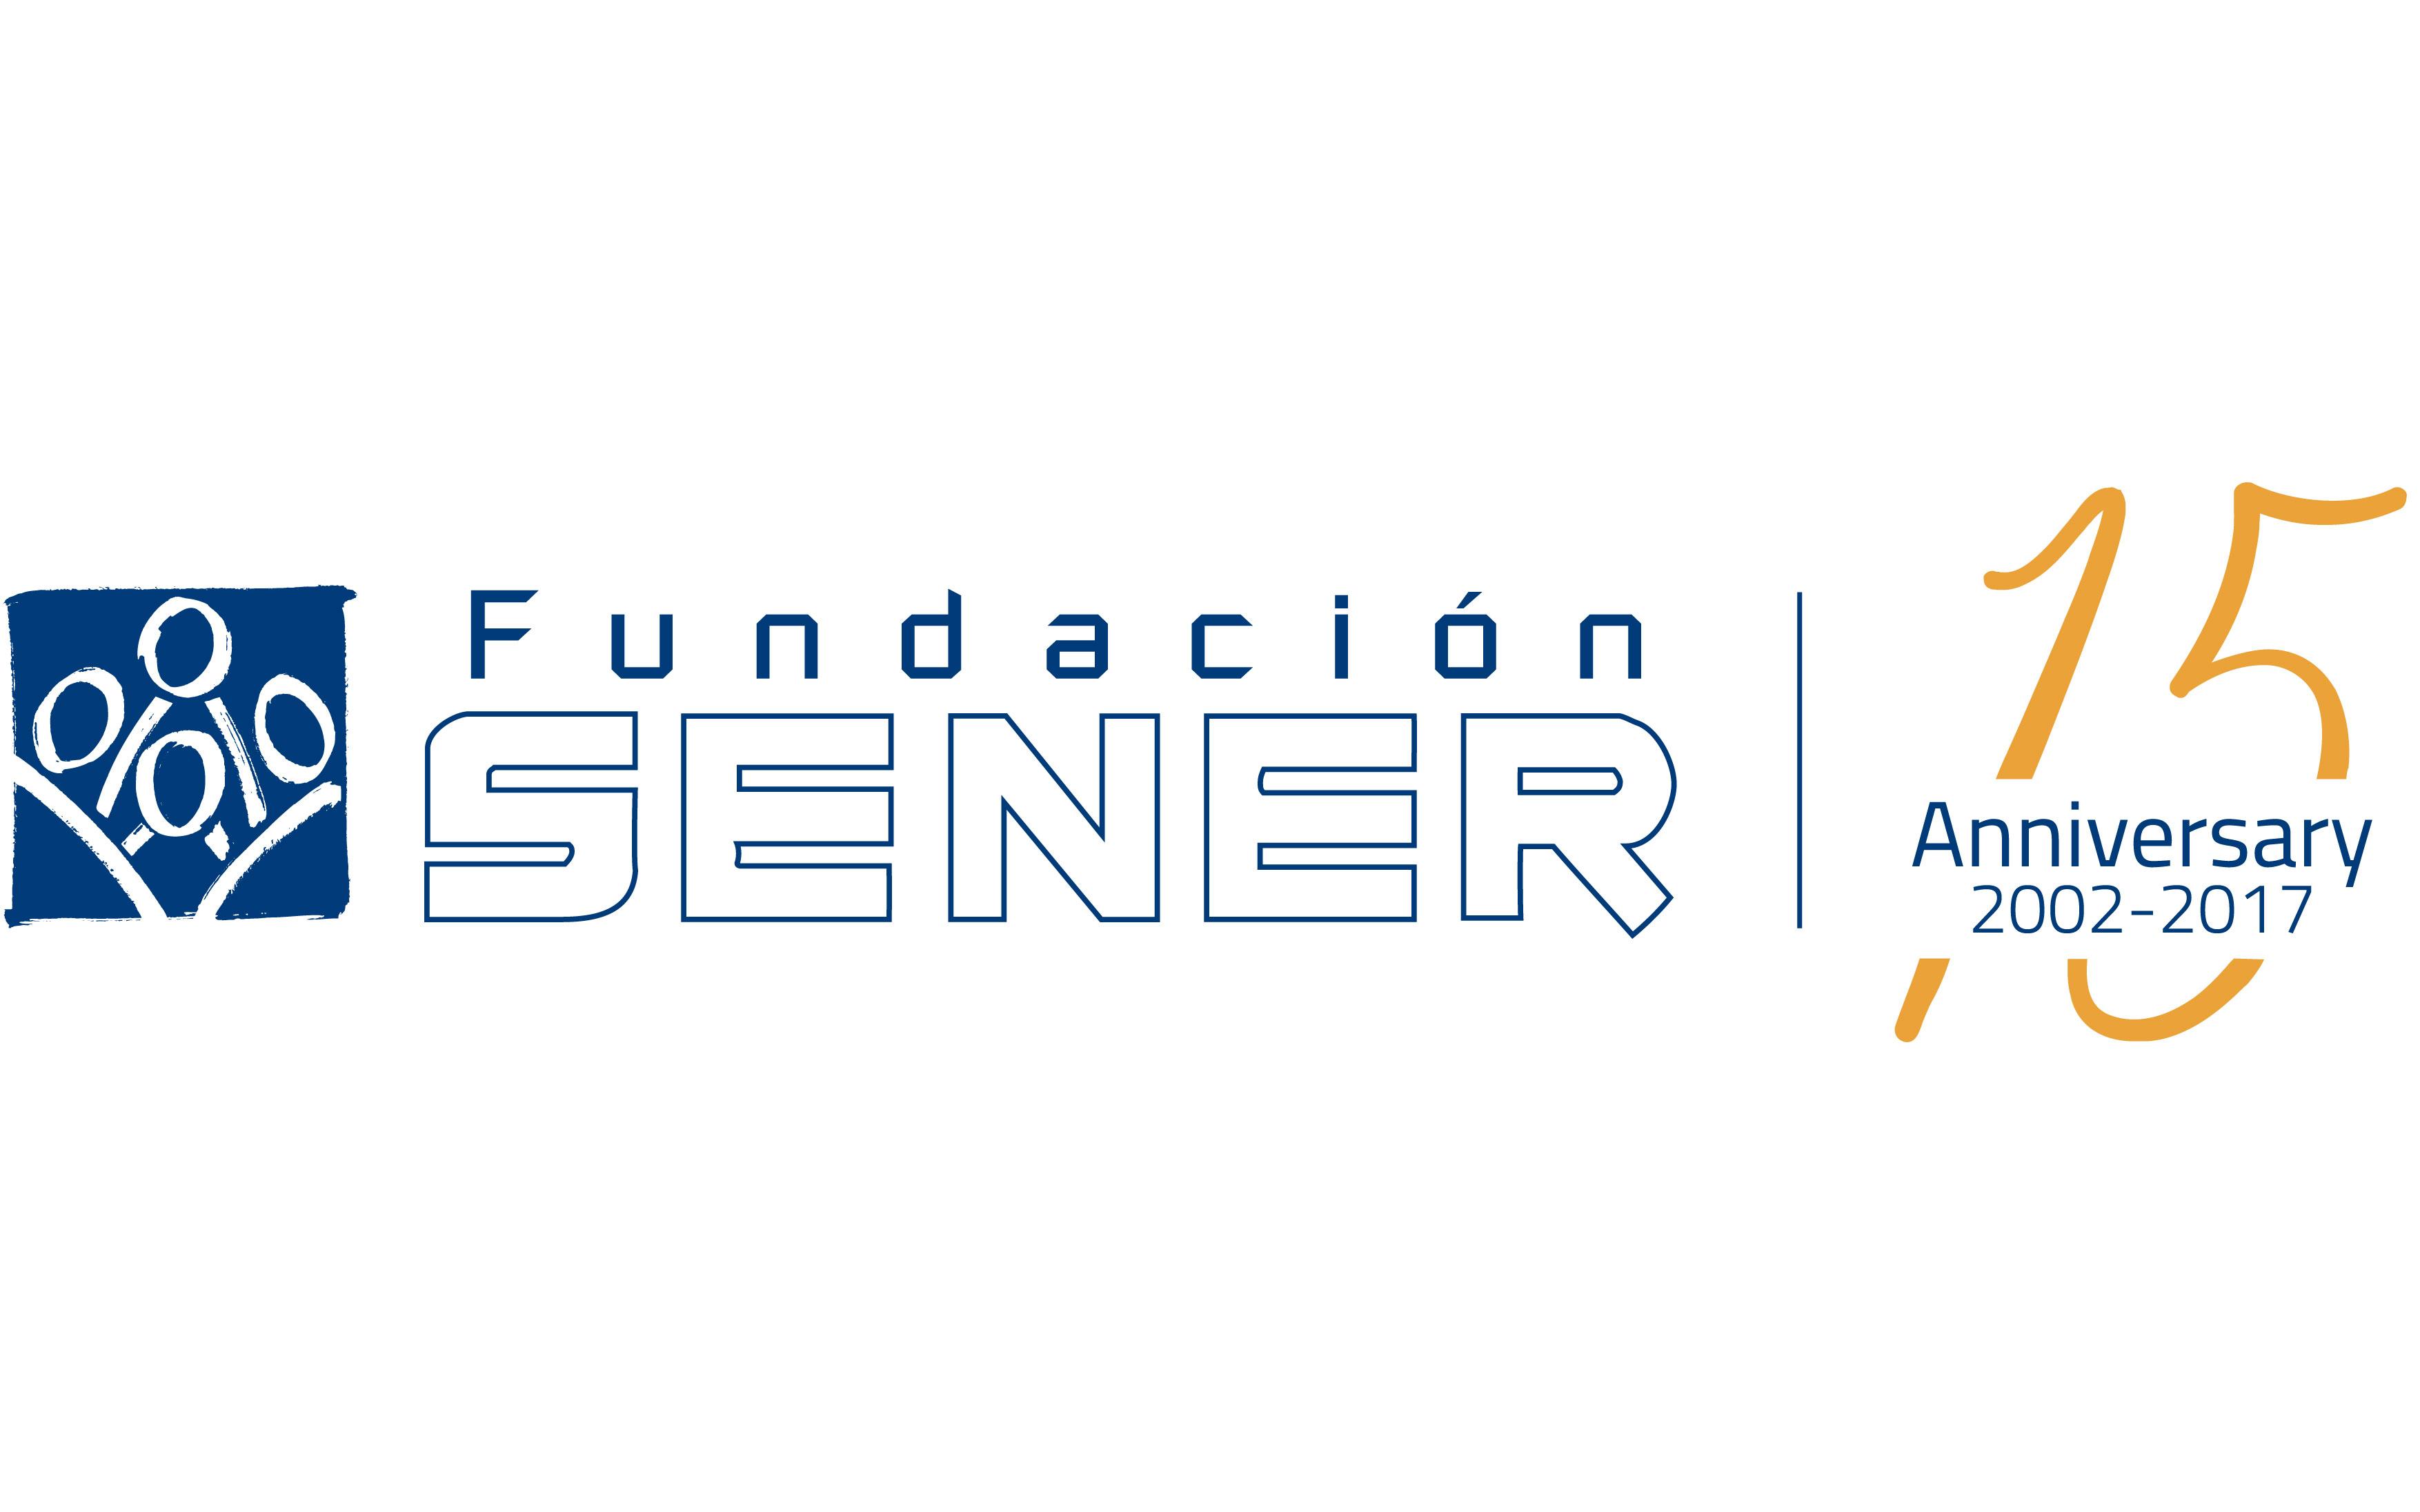 http://www.marine.sener/ecm-images/fundacion-sener-15-aniversario-1_replica_replica